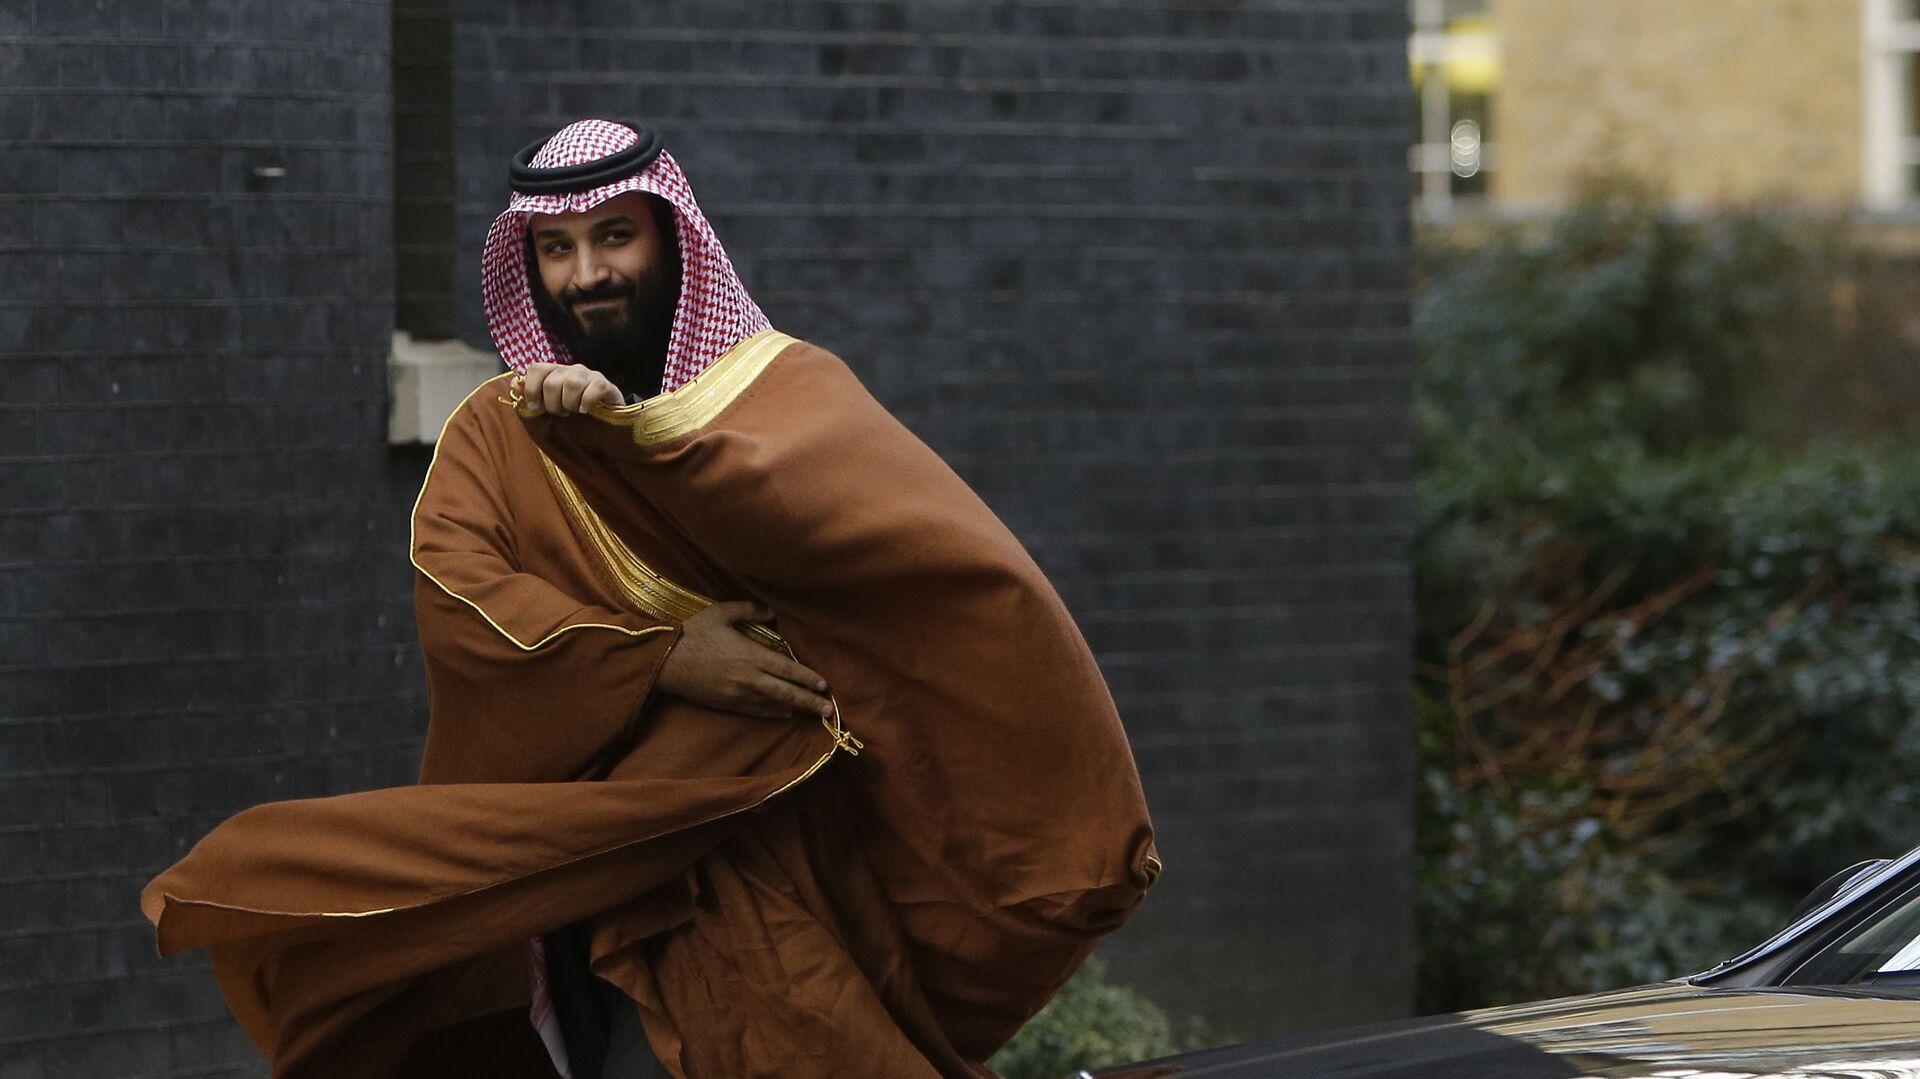 Mohamed bin Salman, príncipe heredero de Arabia Saudí - Sputnik Mundo, 1920, 02.03.2021